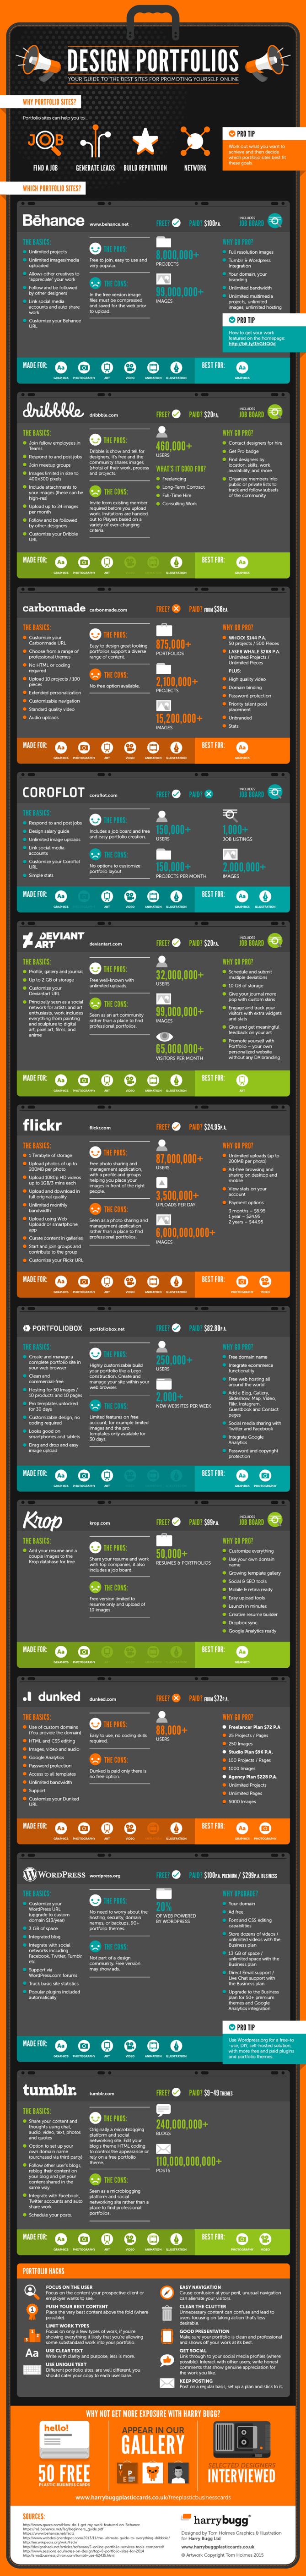 DesignWebsites.png